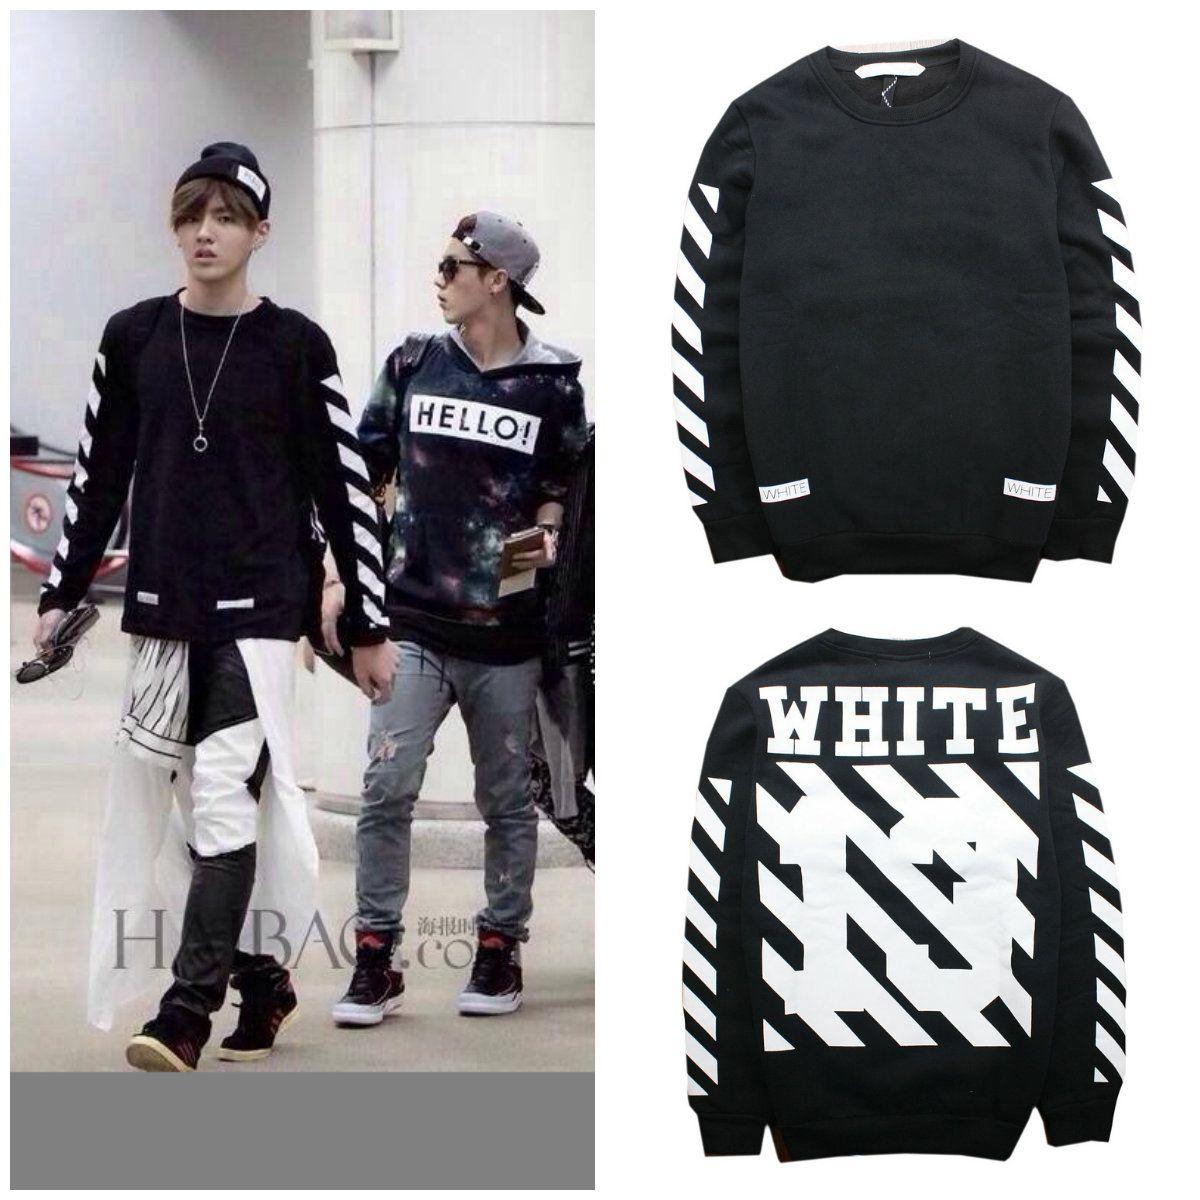 new hip hop fashion pyrex virgil abloh off white 13 long sleeve hoodies striped print sweatshirts from dhgatecom